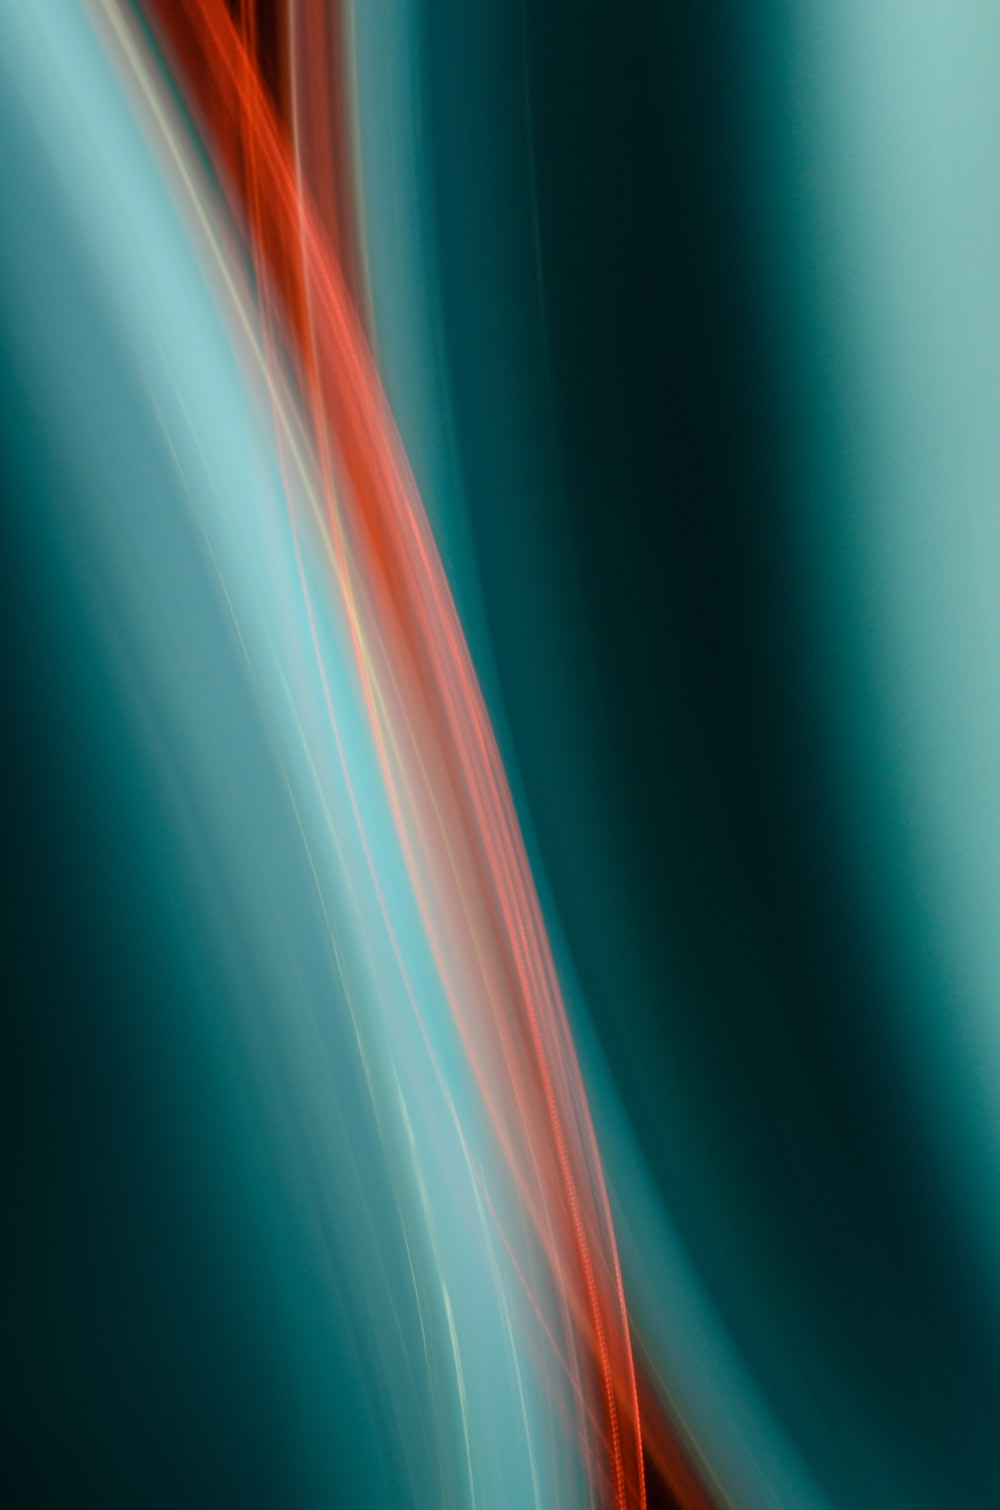 red and blue light digital wallpaper